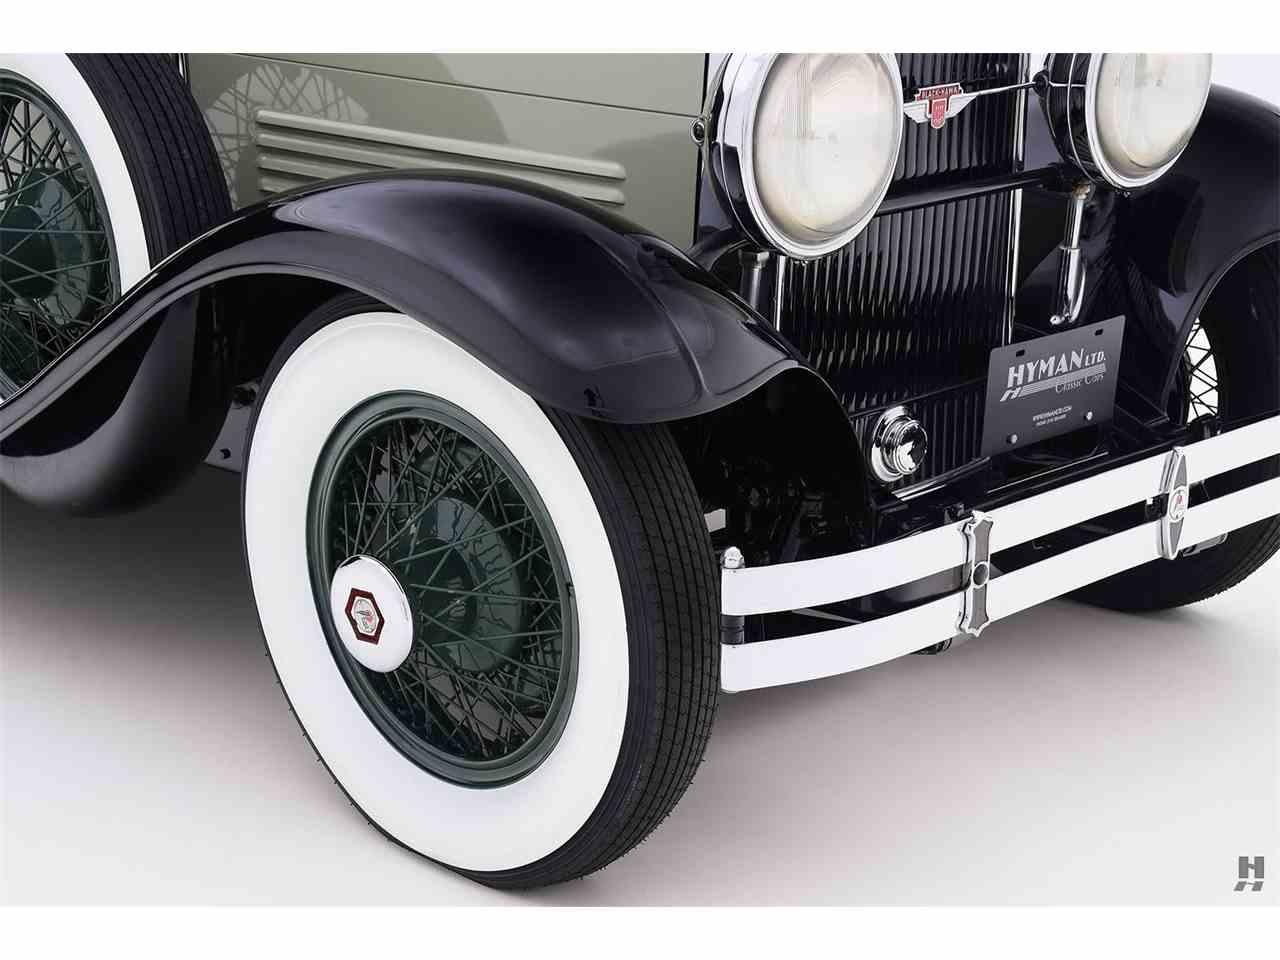 Large Picture of 1929 Stutz Blackhawk located in Missouri - $137,500.00 - JKFP